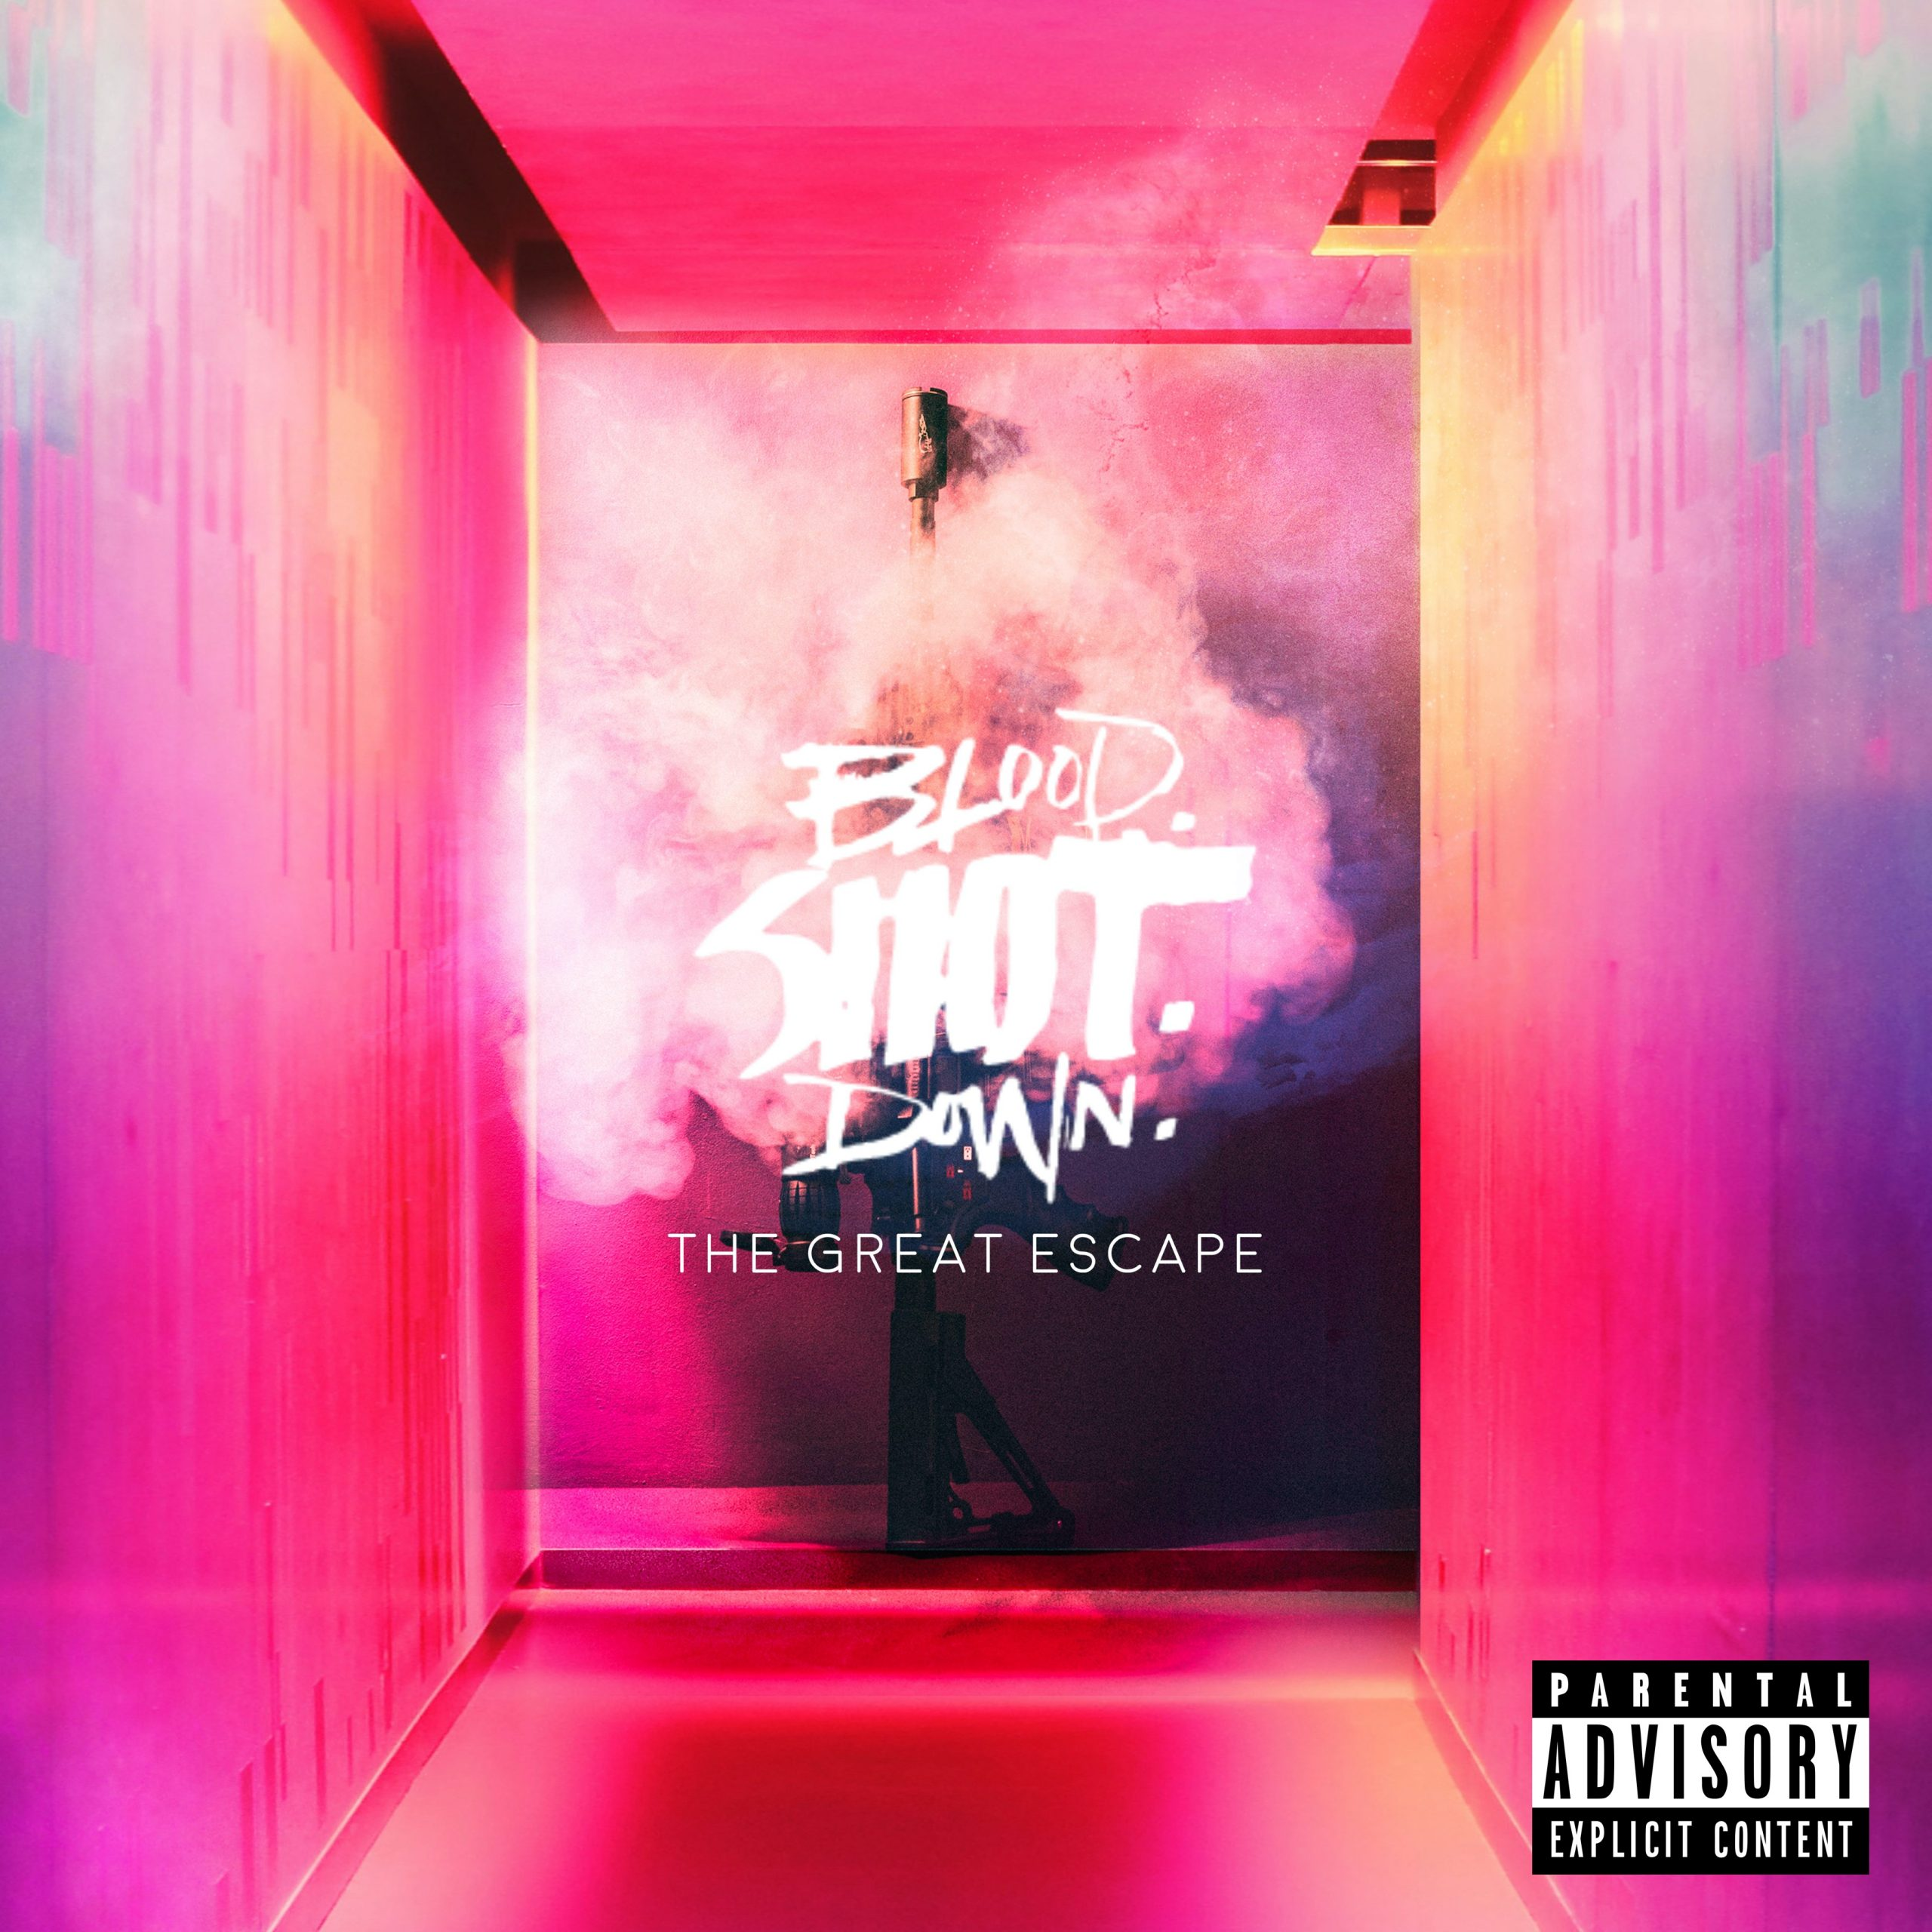 blood-shot-down-the-great-escape-ein-album-review